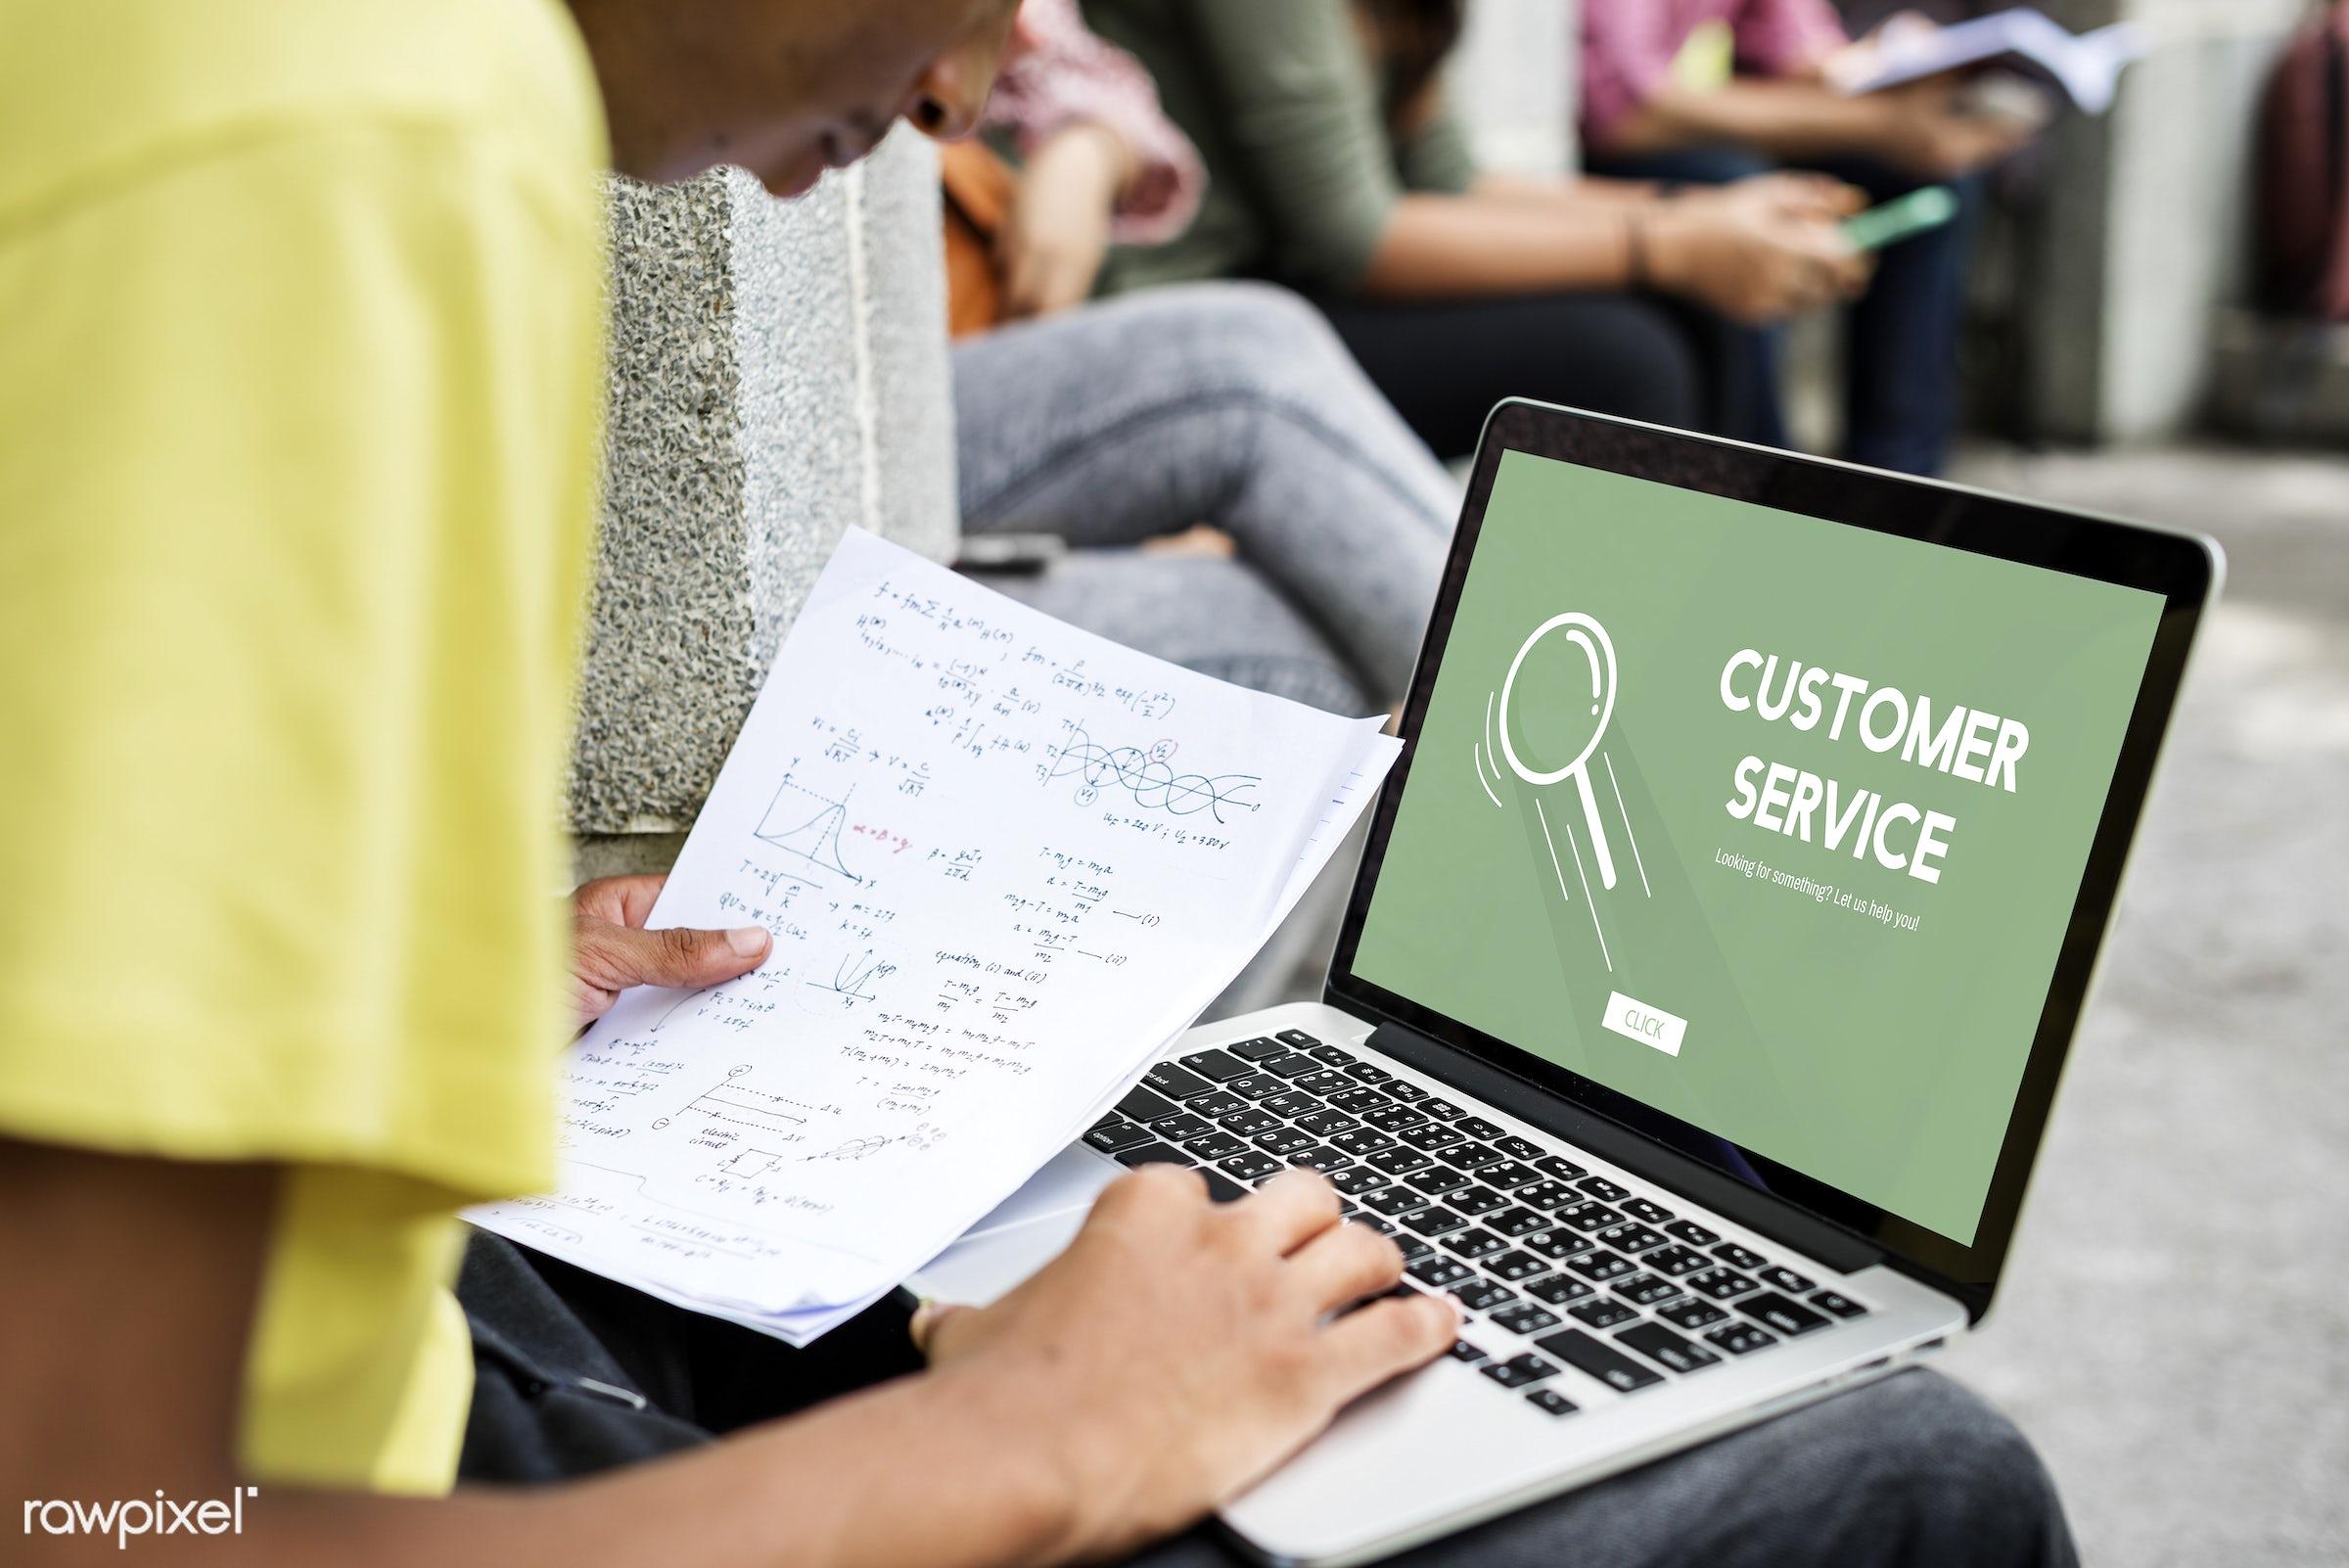 boy, calculation, digital device, gadget, graph, guy, holding, laptop, learning, man, math, mathematics, note, notebook,...